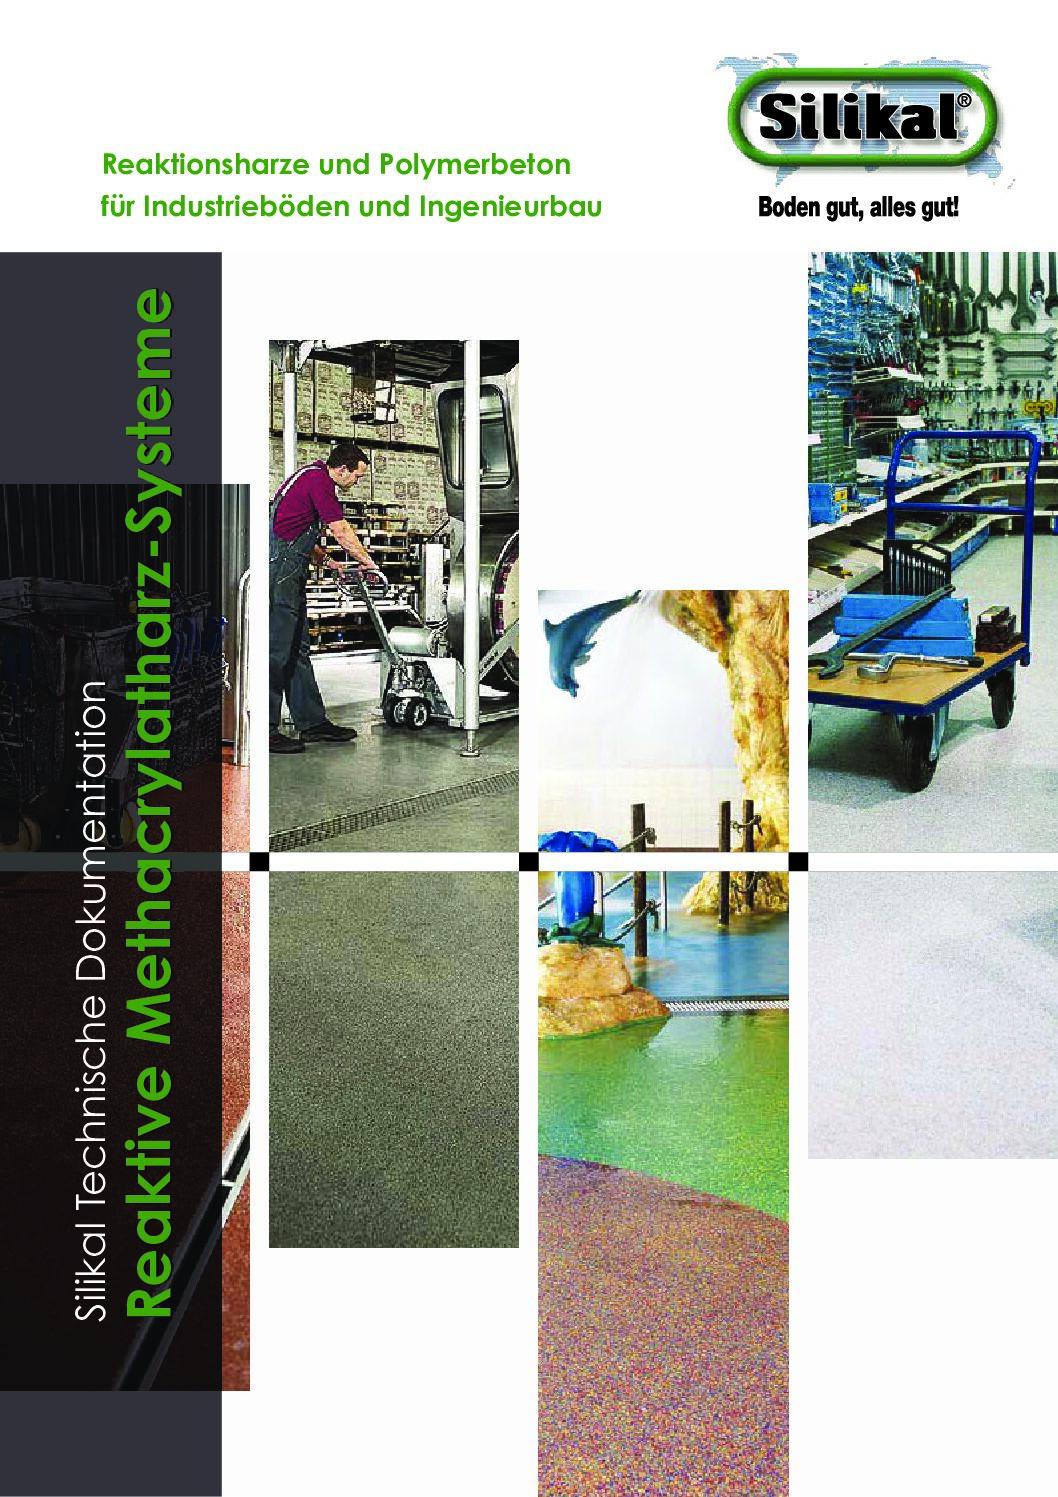 Silikal Broschüre für Reaktive Methacrylatharz Systeme